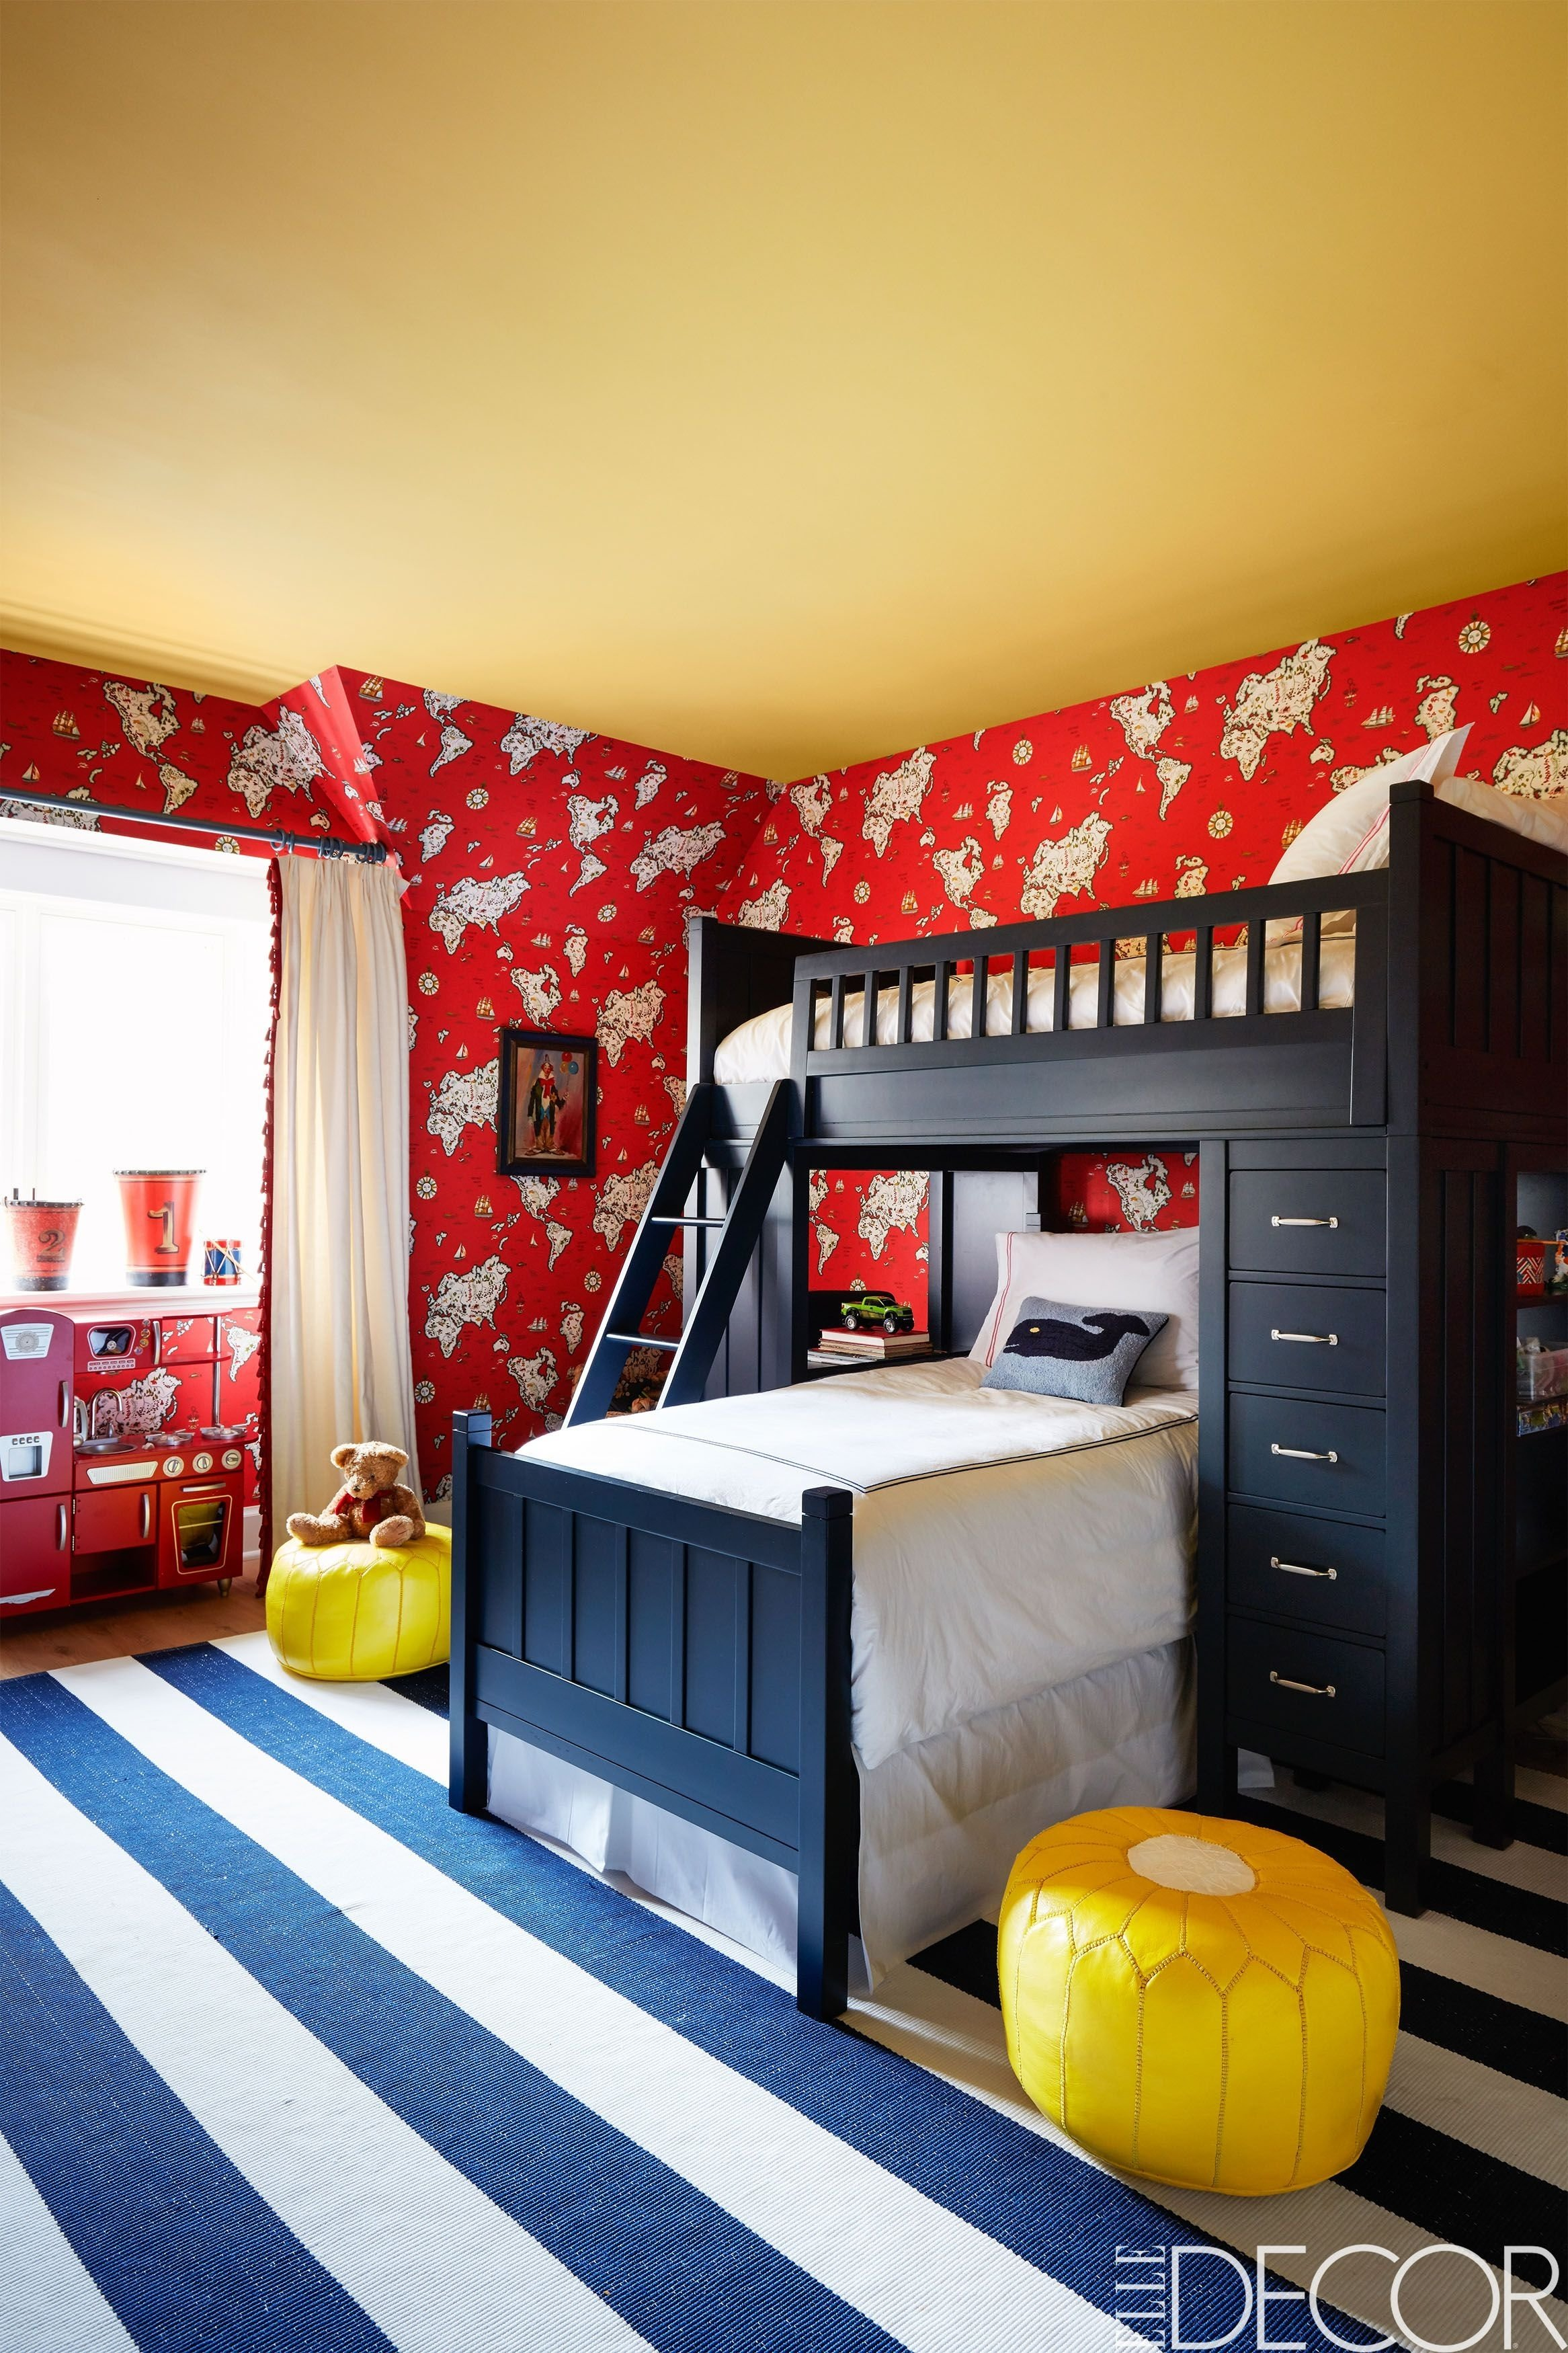 10 Most Popular Ideas For A Boys Room 15 cool boys bedroom ideas decorating a little boy room 2 2020